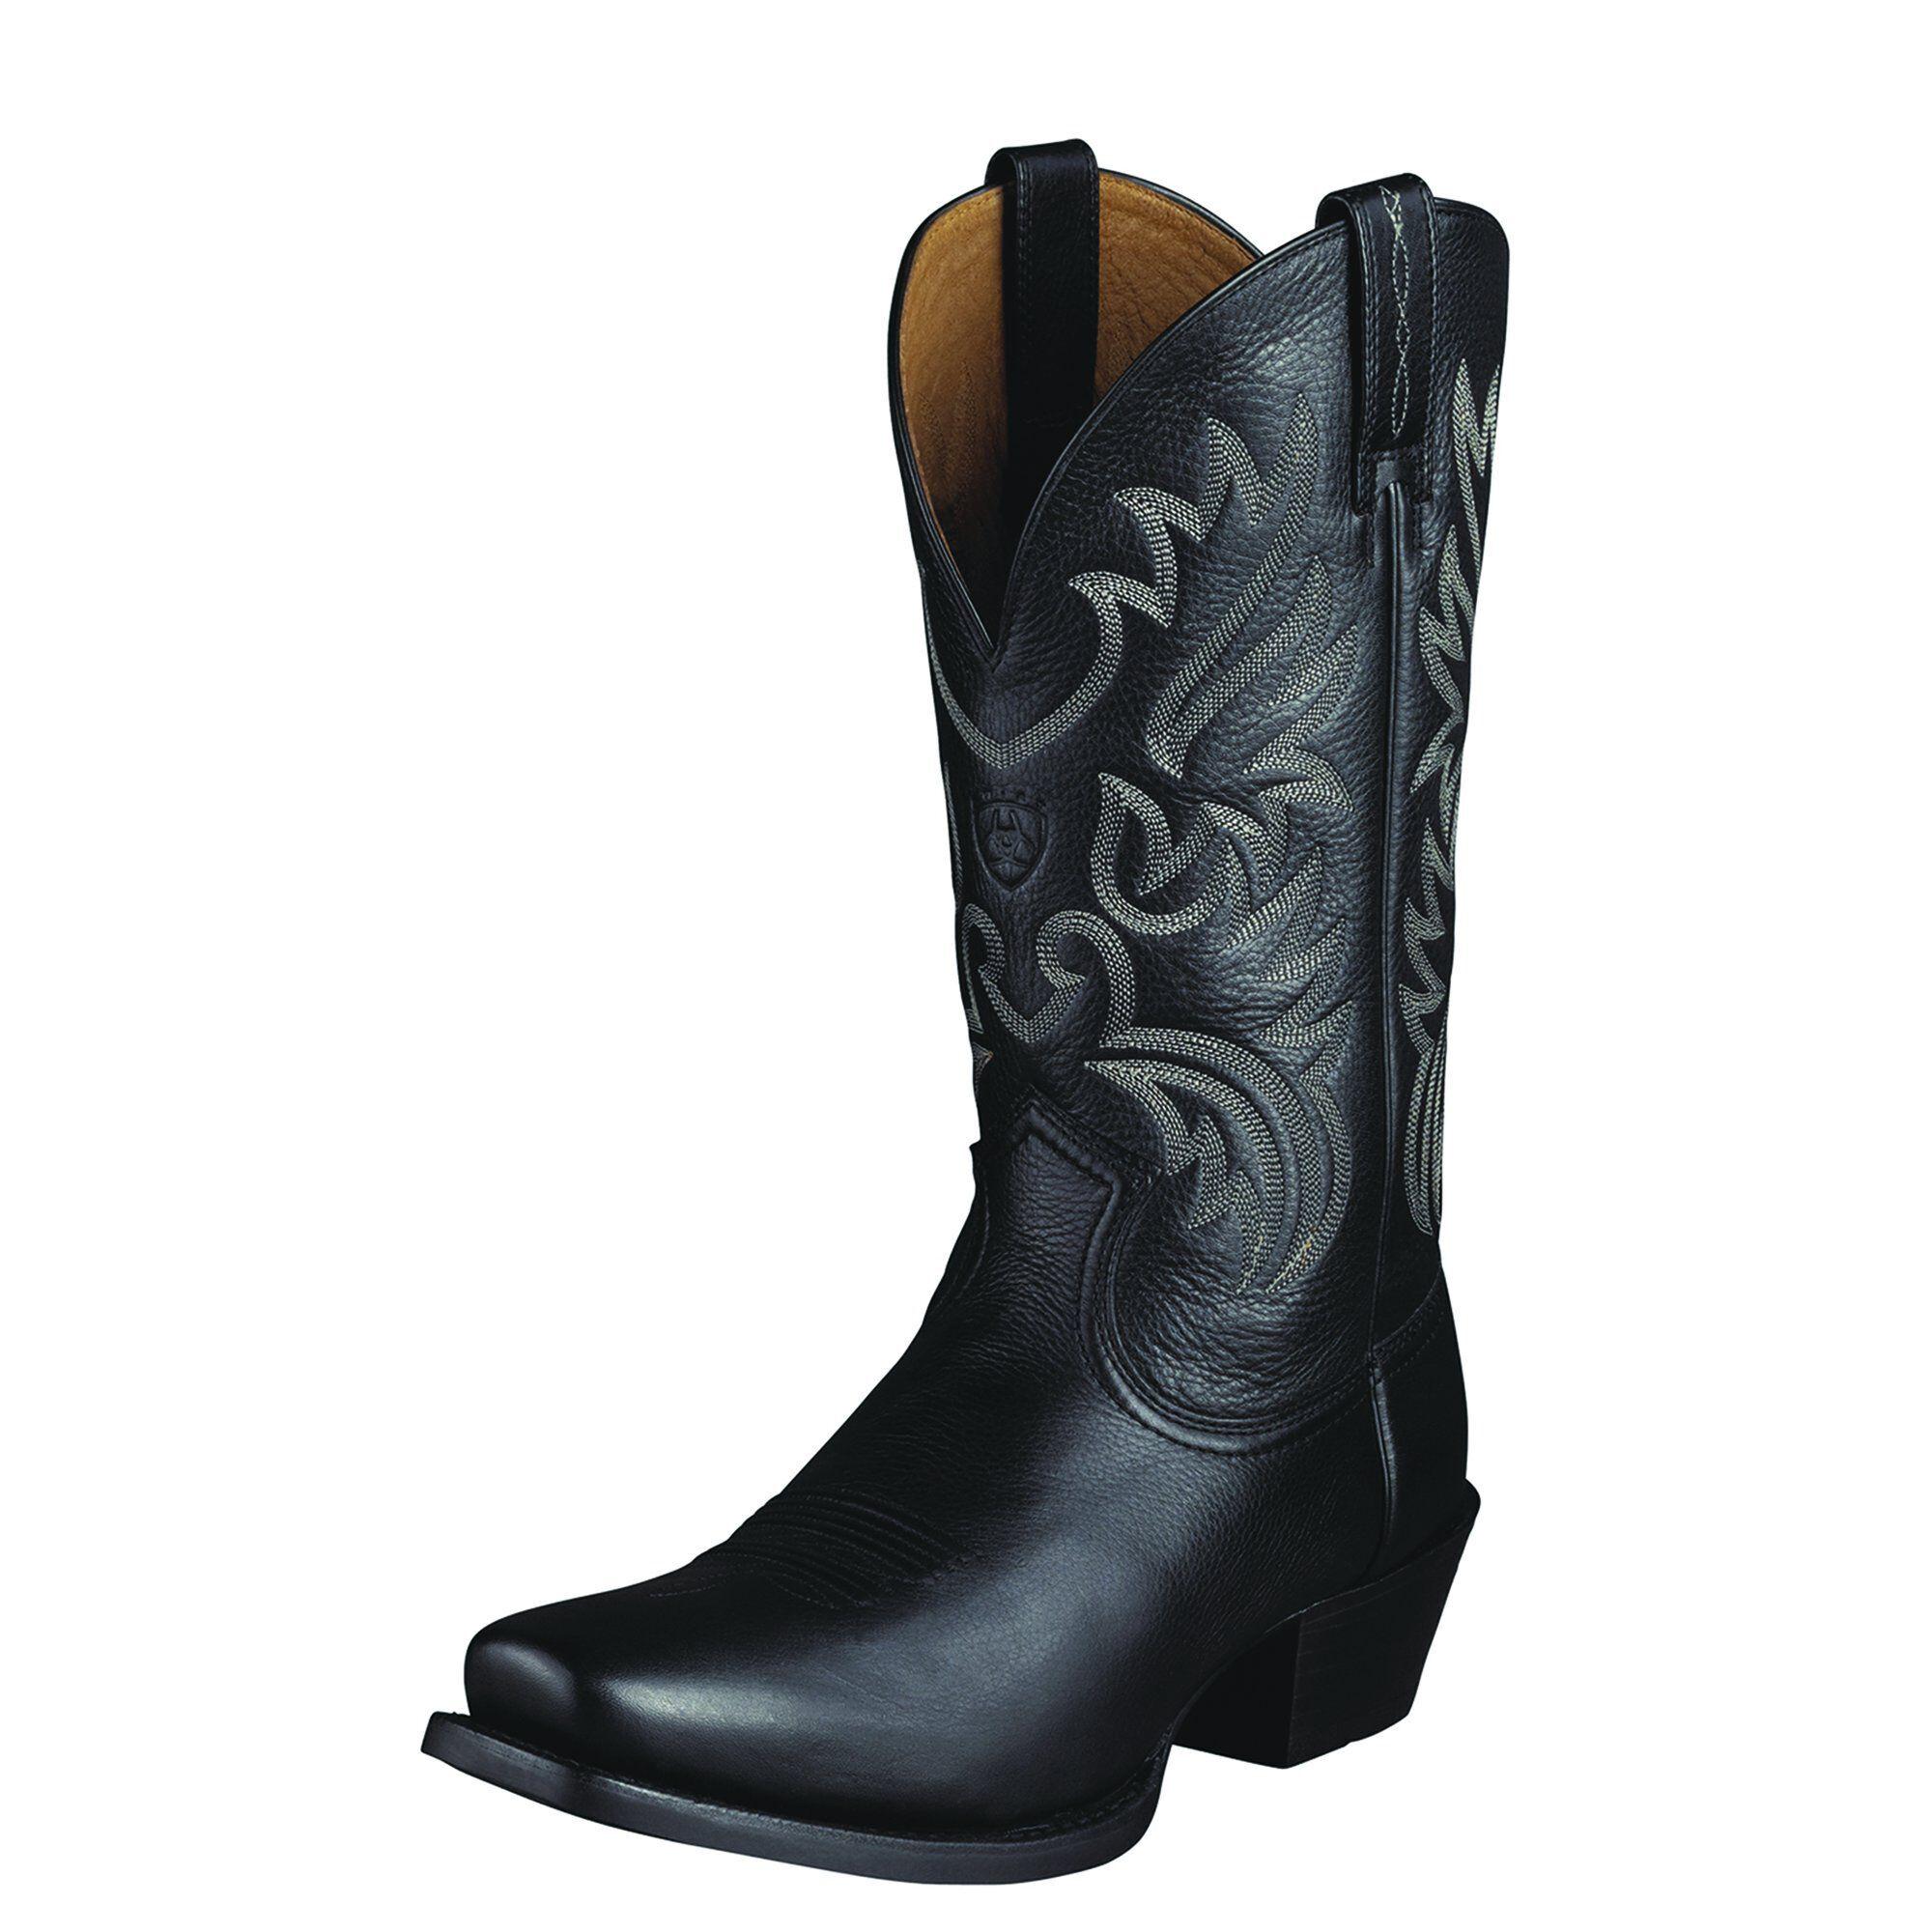 Ariat Men's Legend Western Boots in Black Deertan Leather, Size 9.5 D / Medium by Ariat